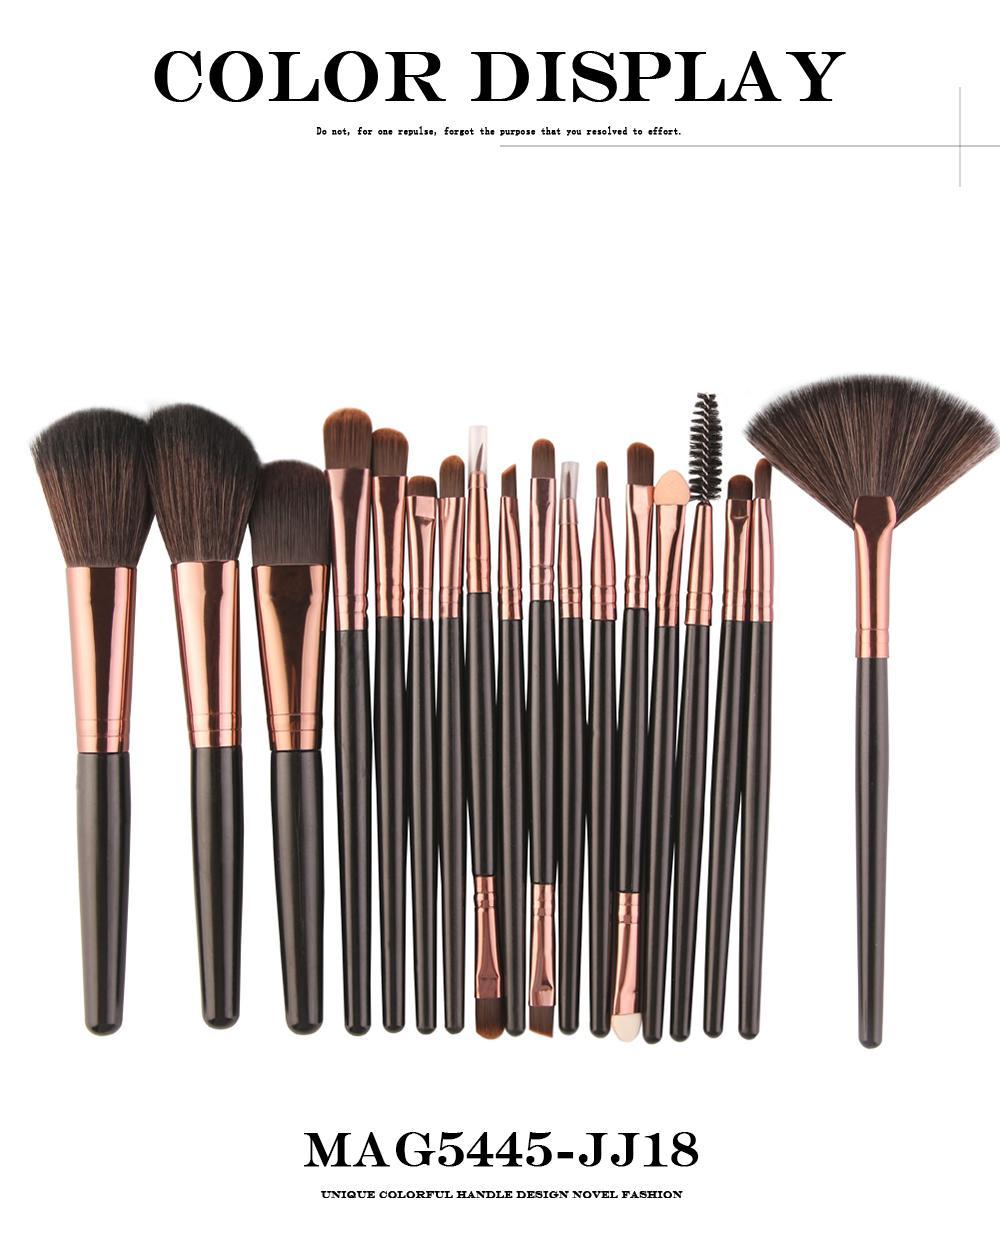 18 Unids / pack Pinceles de Maquillaje Conjunto de Herramientas Cosmético Base de Sombra de Ojos Blush Blending Beauty Make Up Brush Maquiagem DHL GRATIS